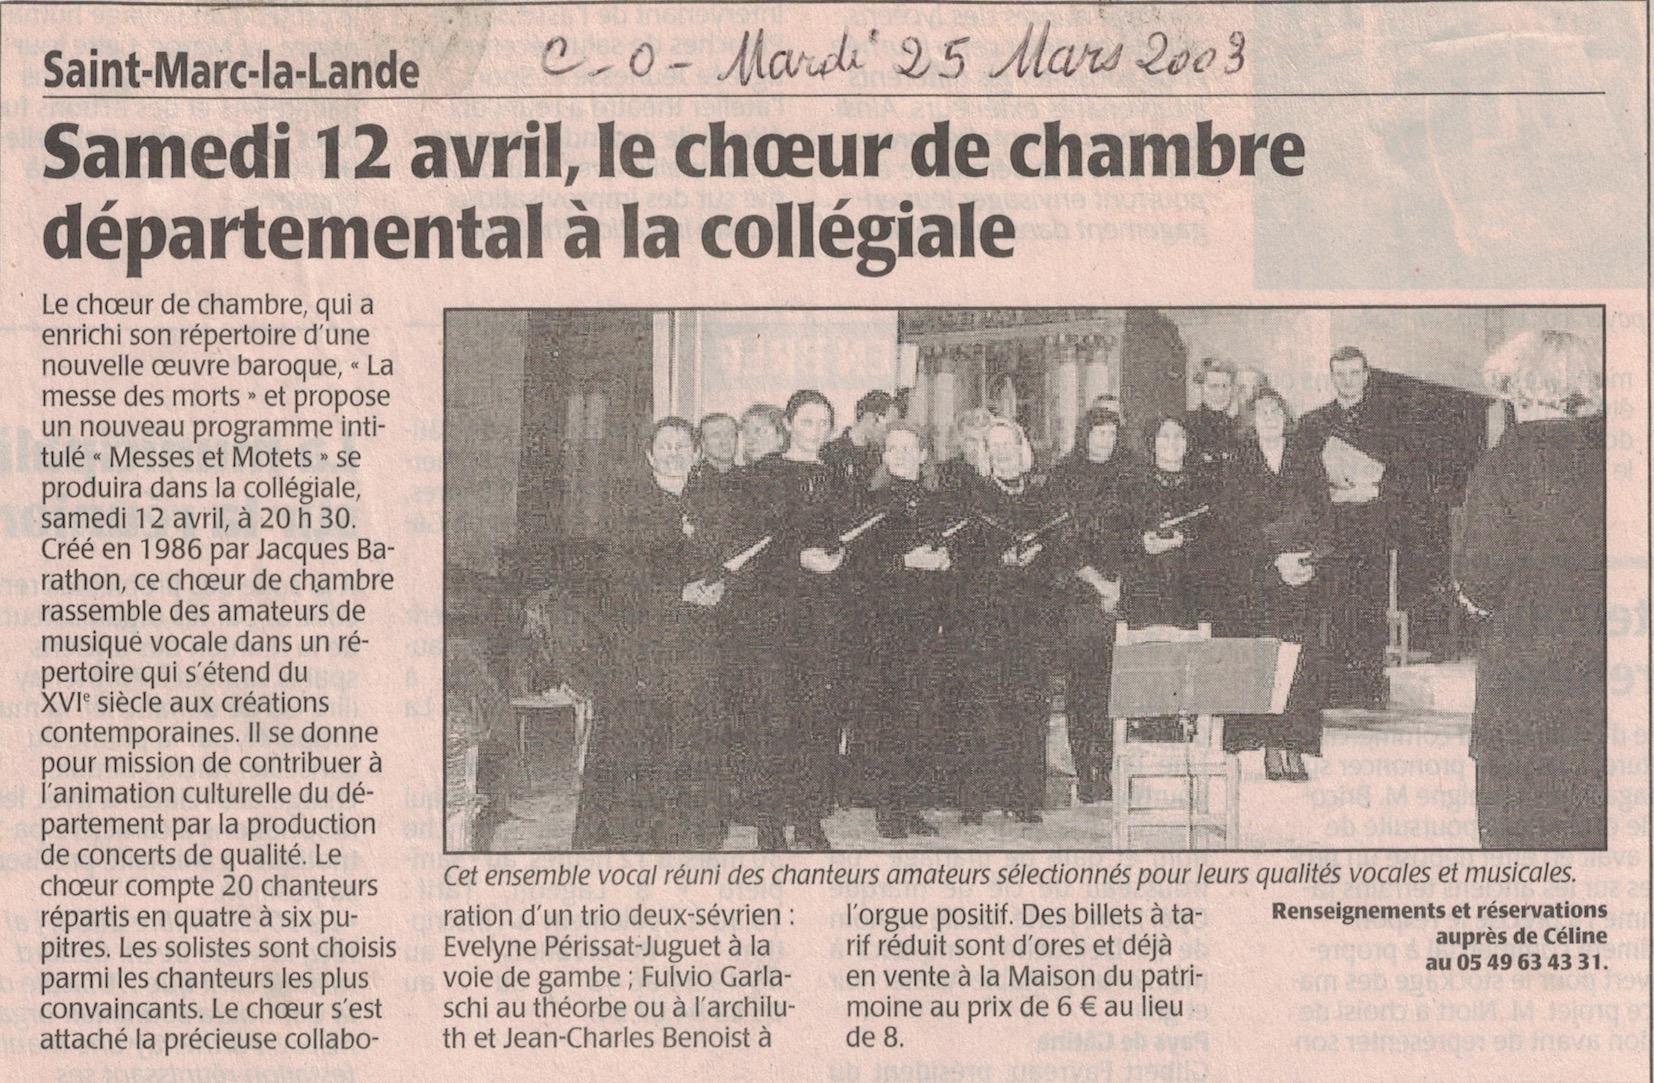 Saint-Marc-la-Lande, mars 2003 1